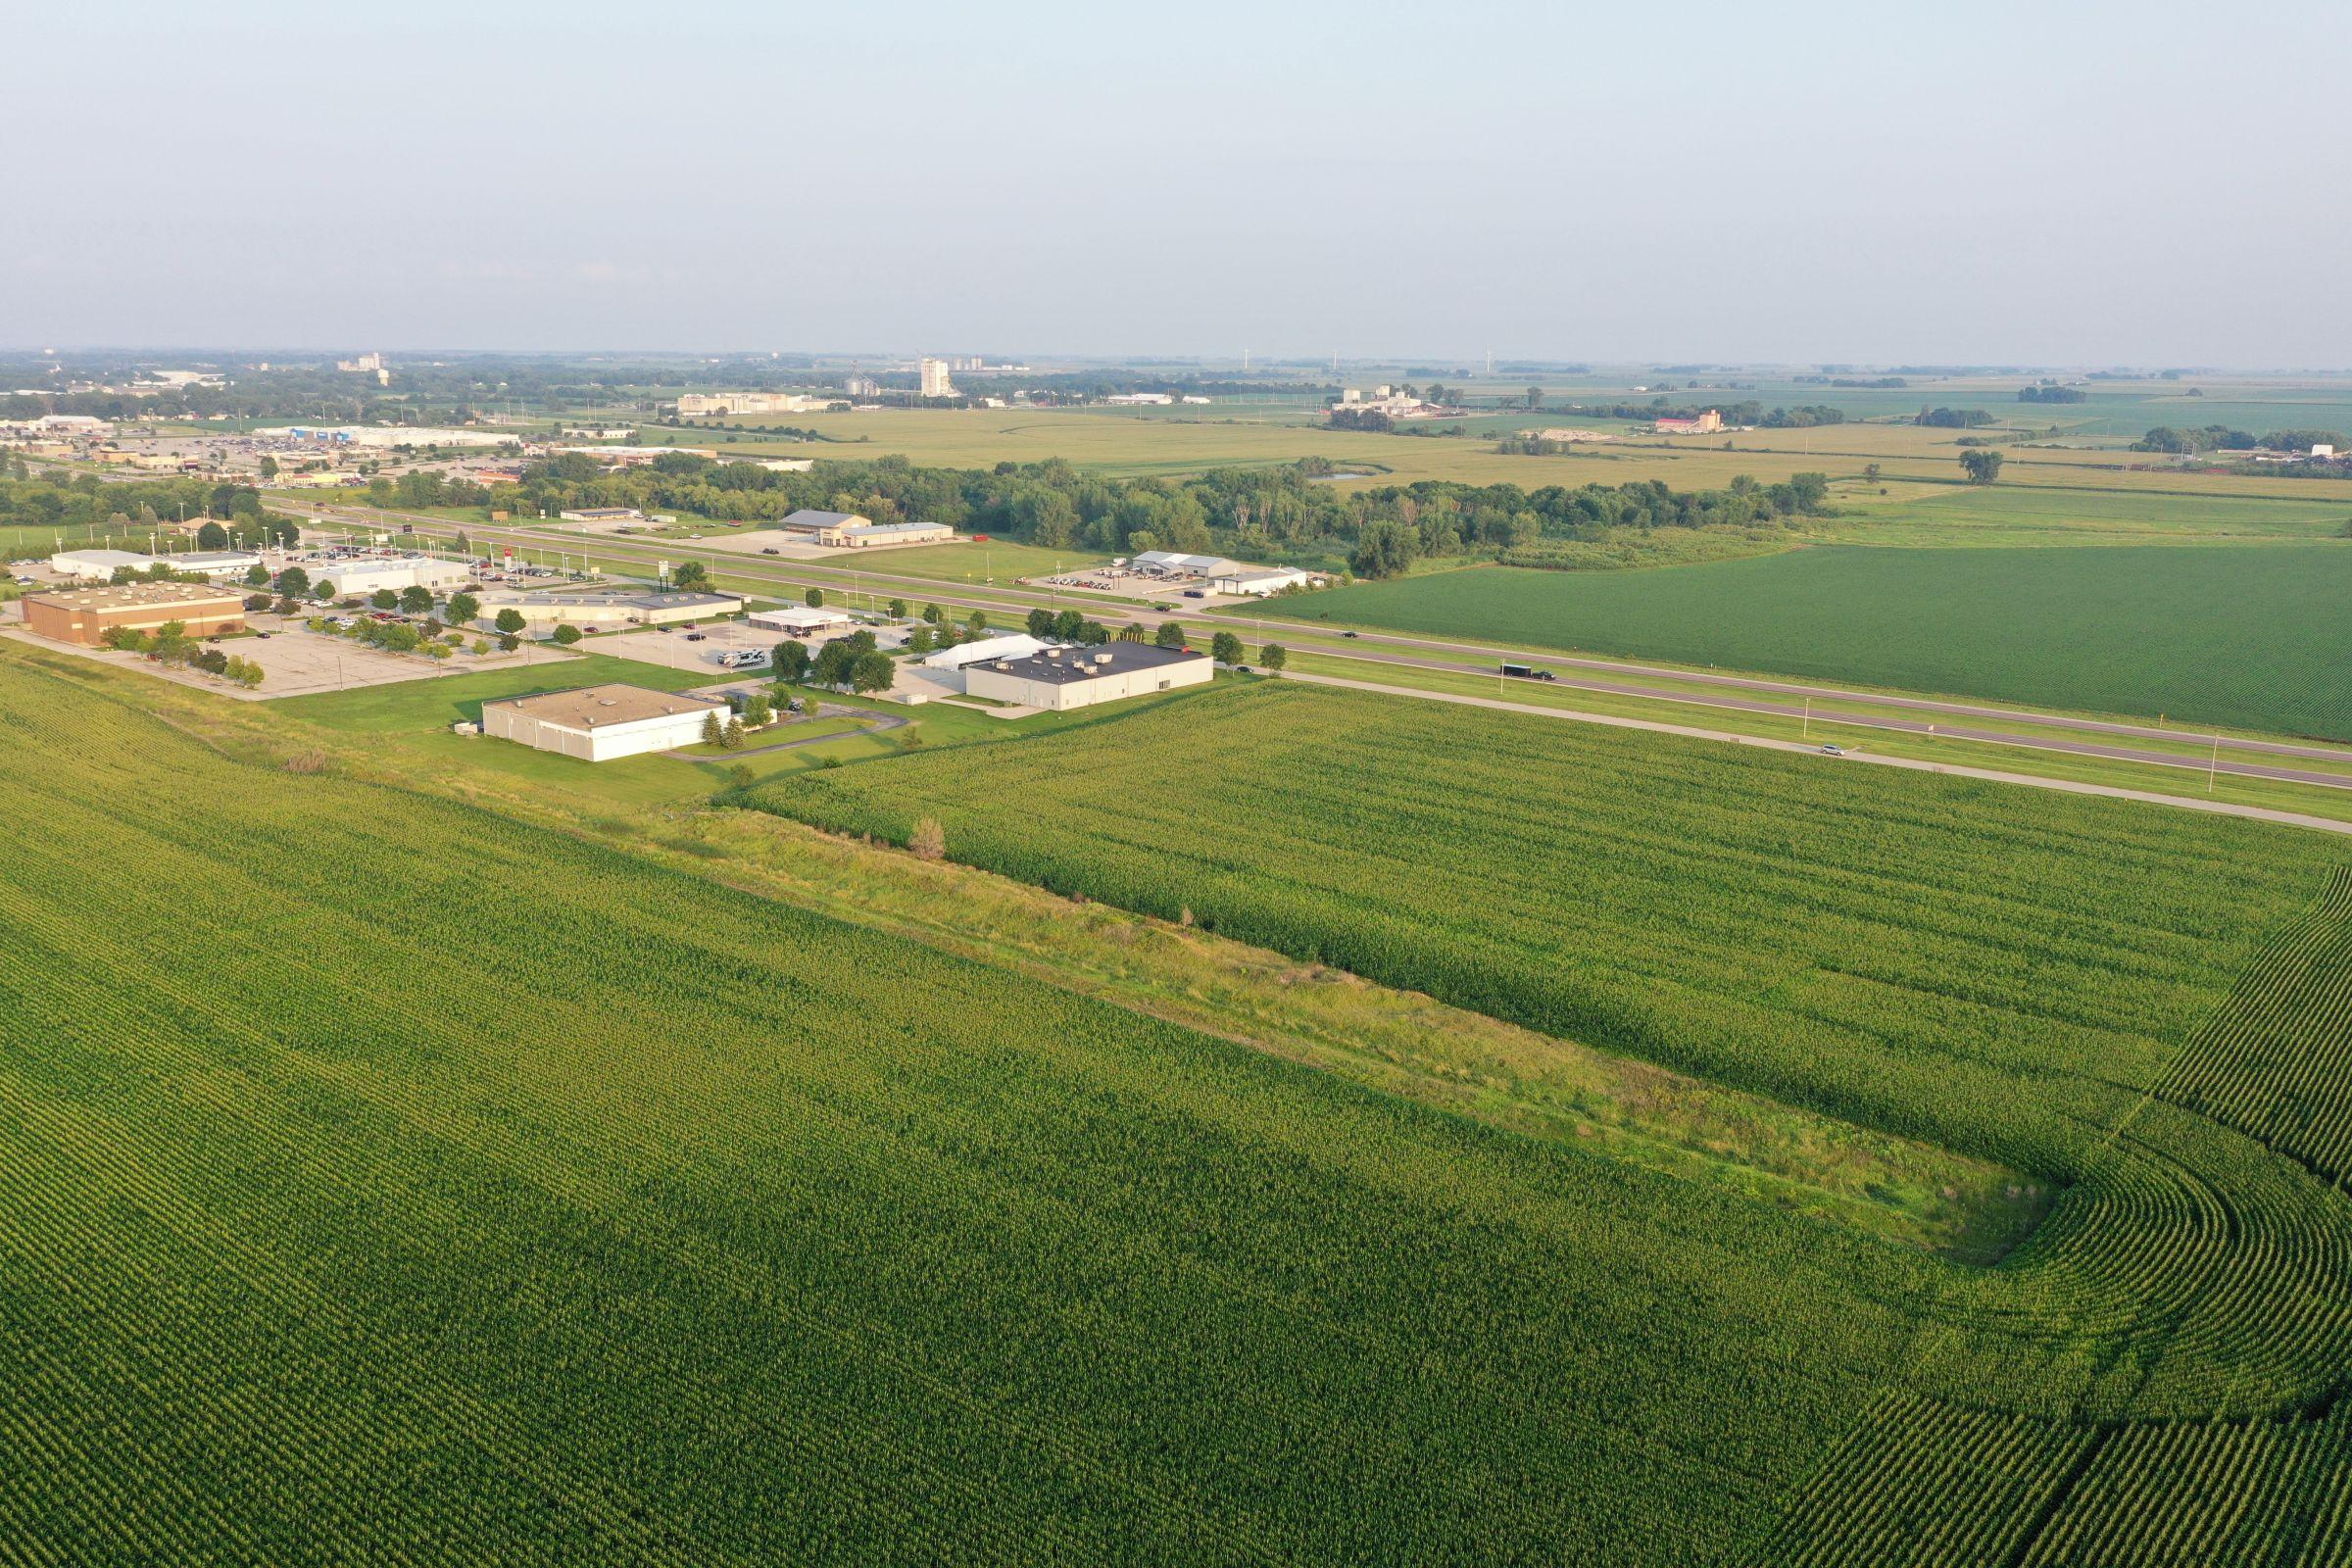 development-land-commercial-cerro-gordo-county-iowa-4-acres-listing-number-15642-2-2021-07-19-160052.jpg